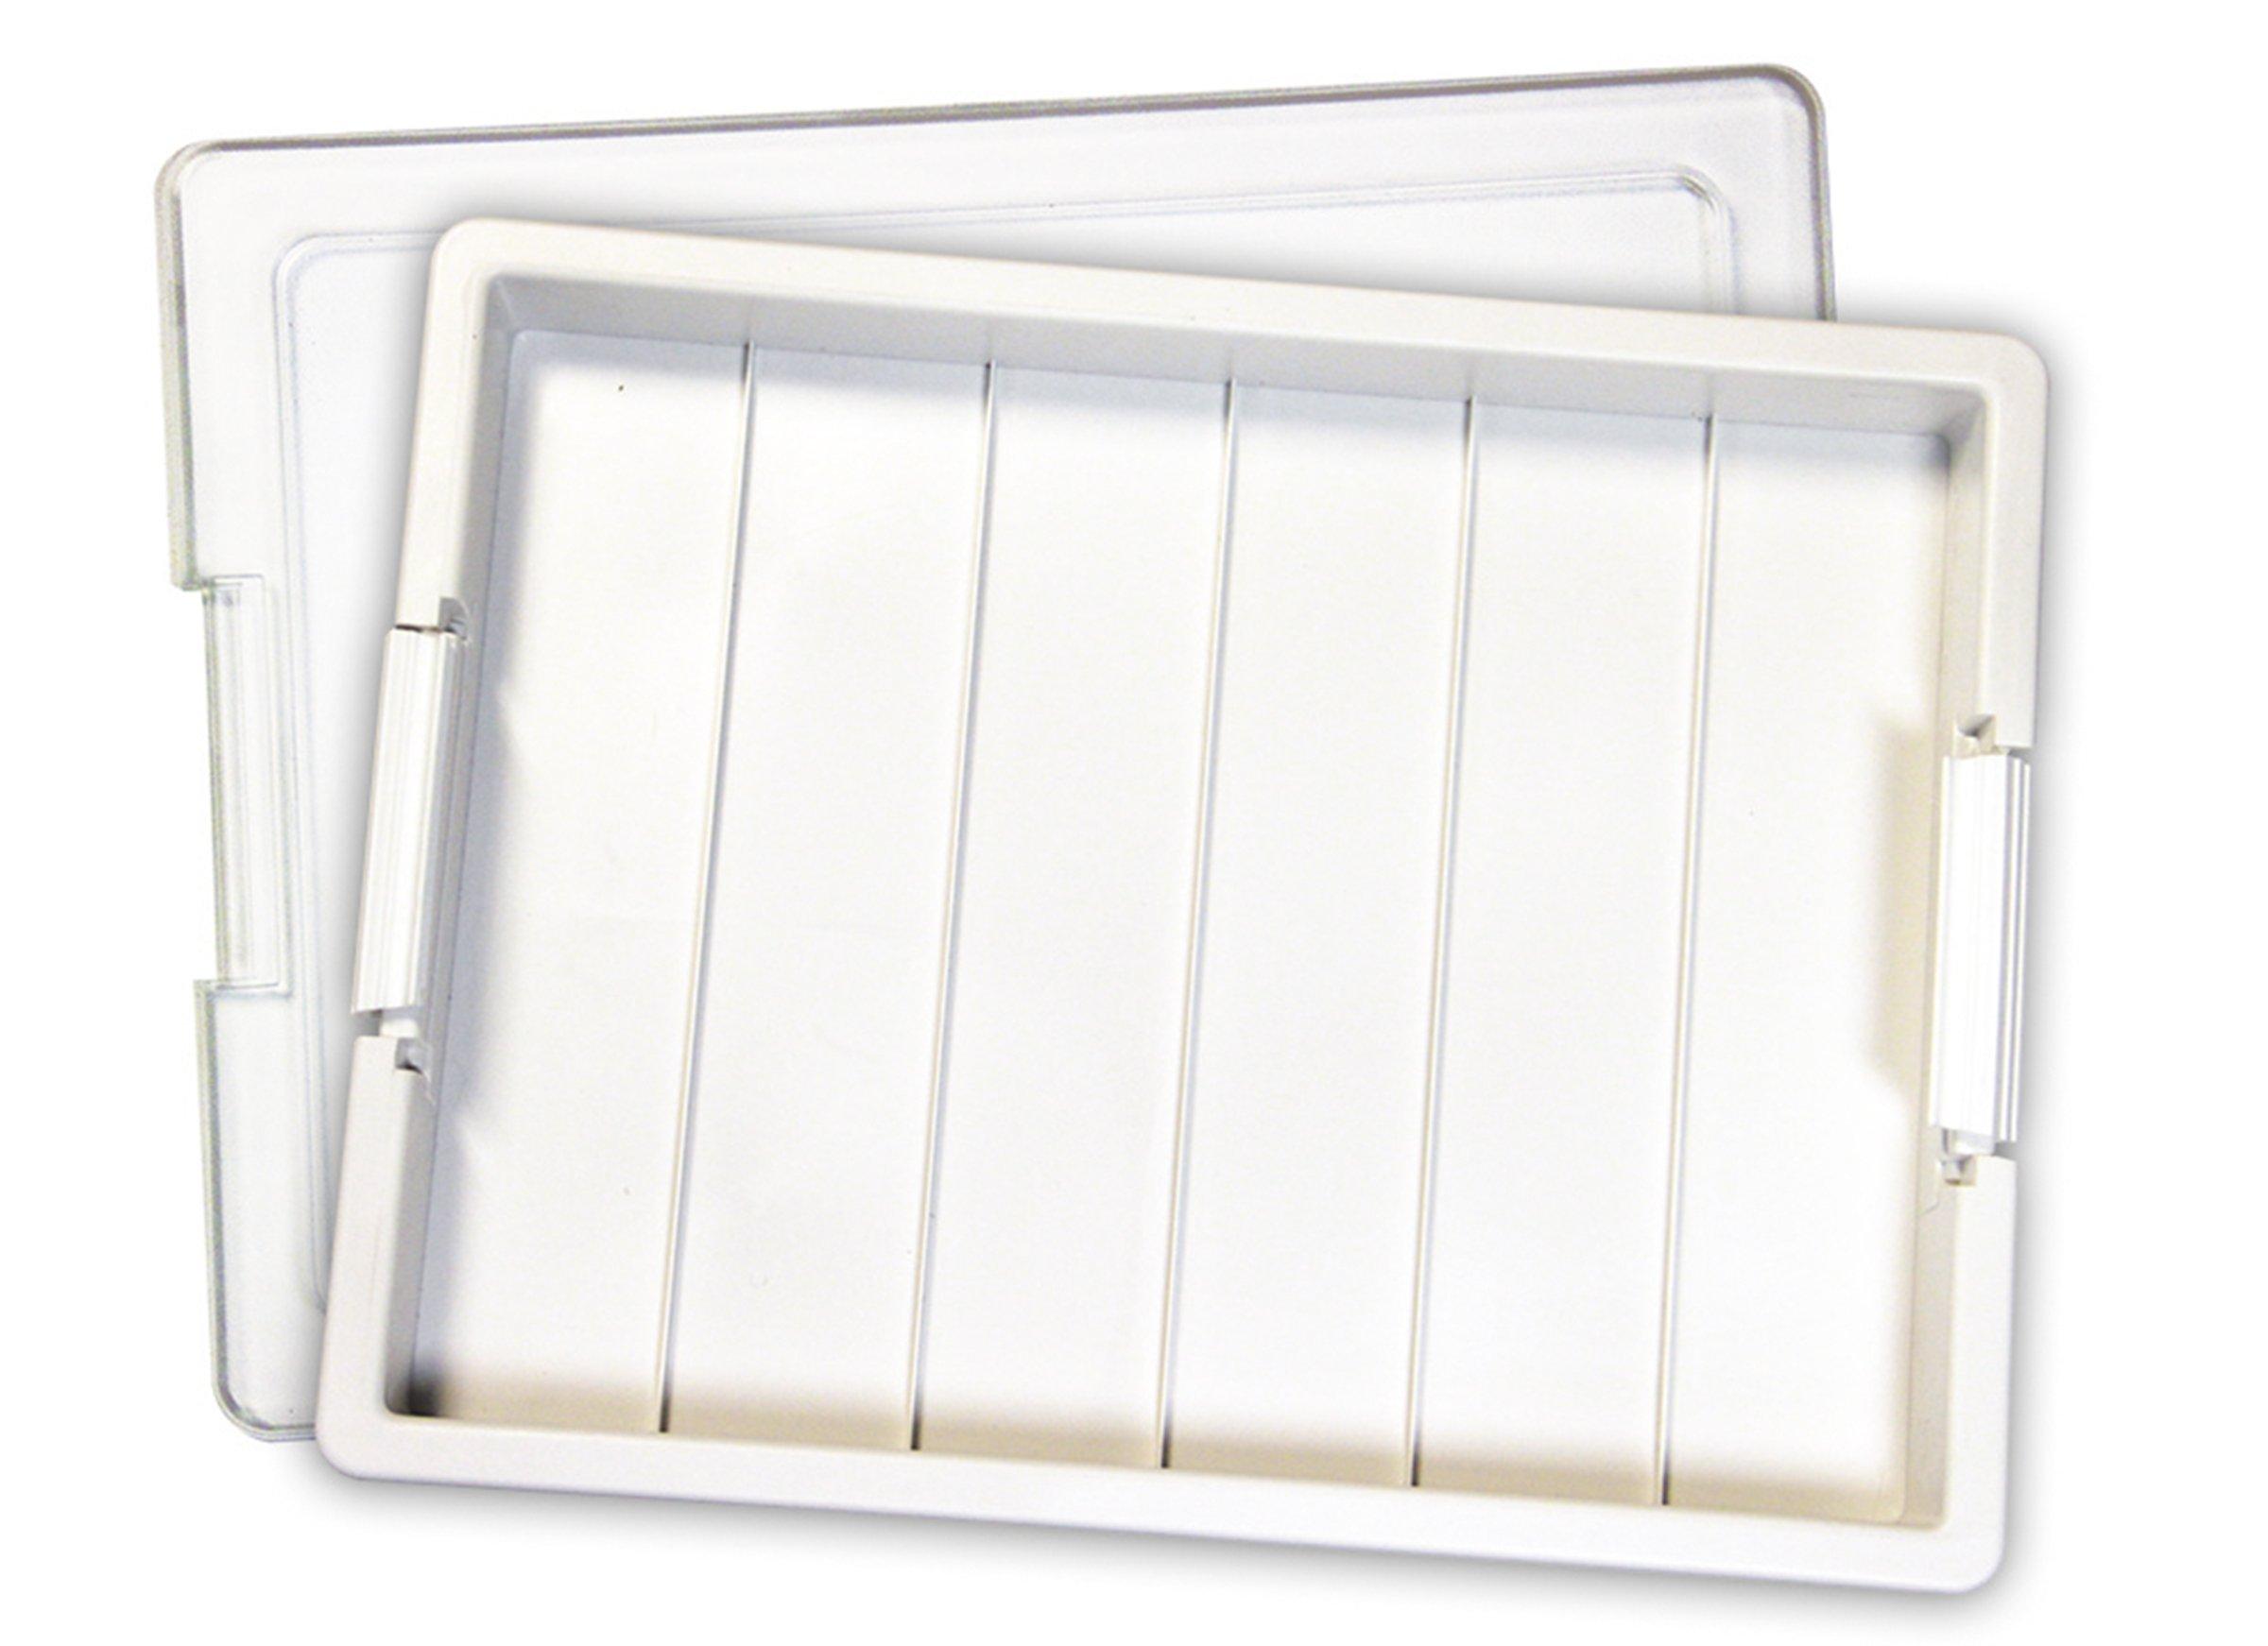 78 C Darice Elizabeth Ward Bead Storage Solutions 82-Piece Tiny Container Tray